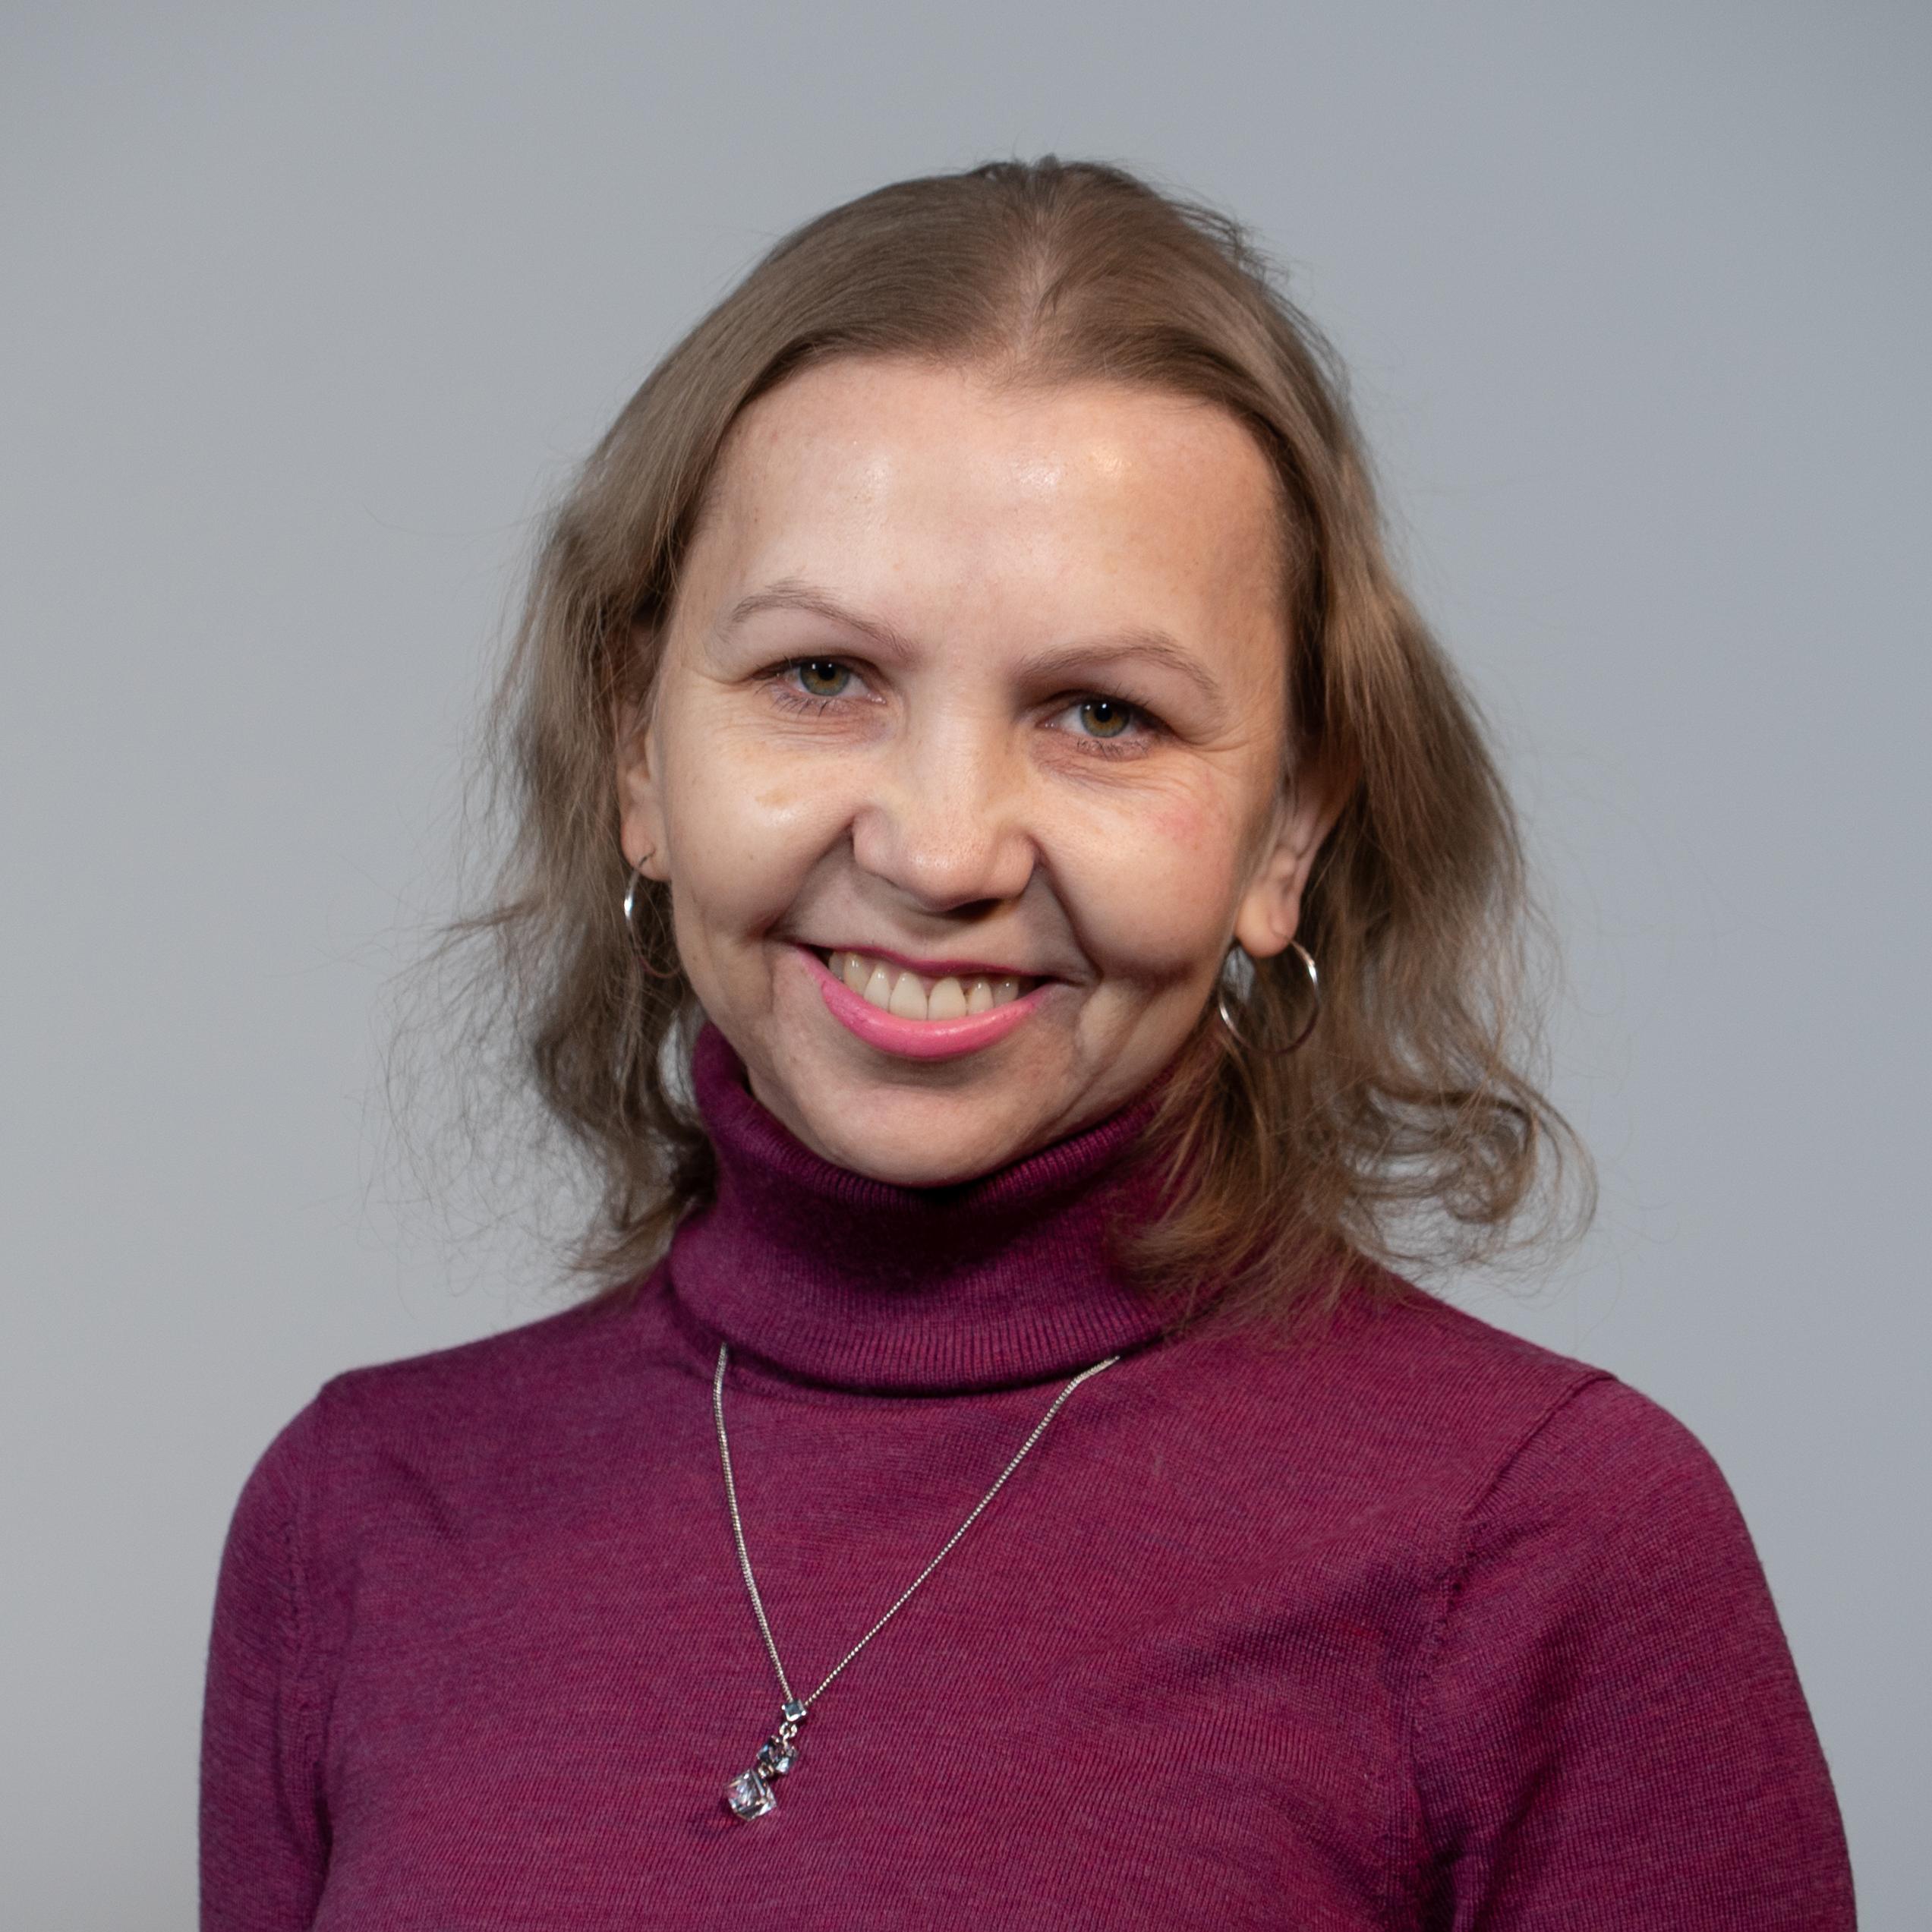 Минина Анастасия Александровна